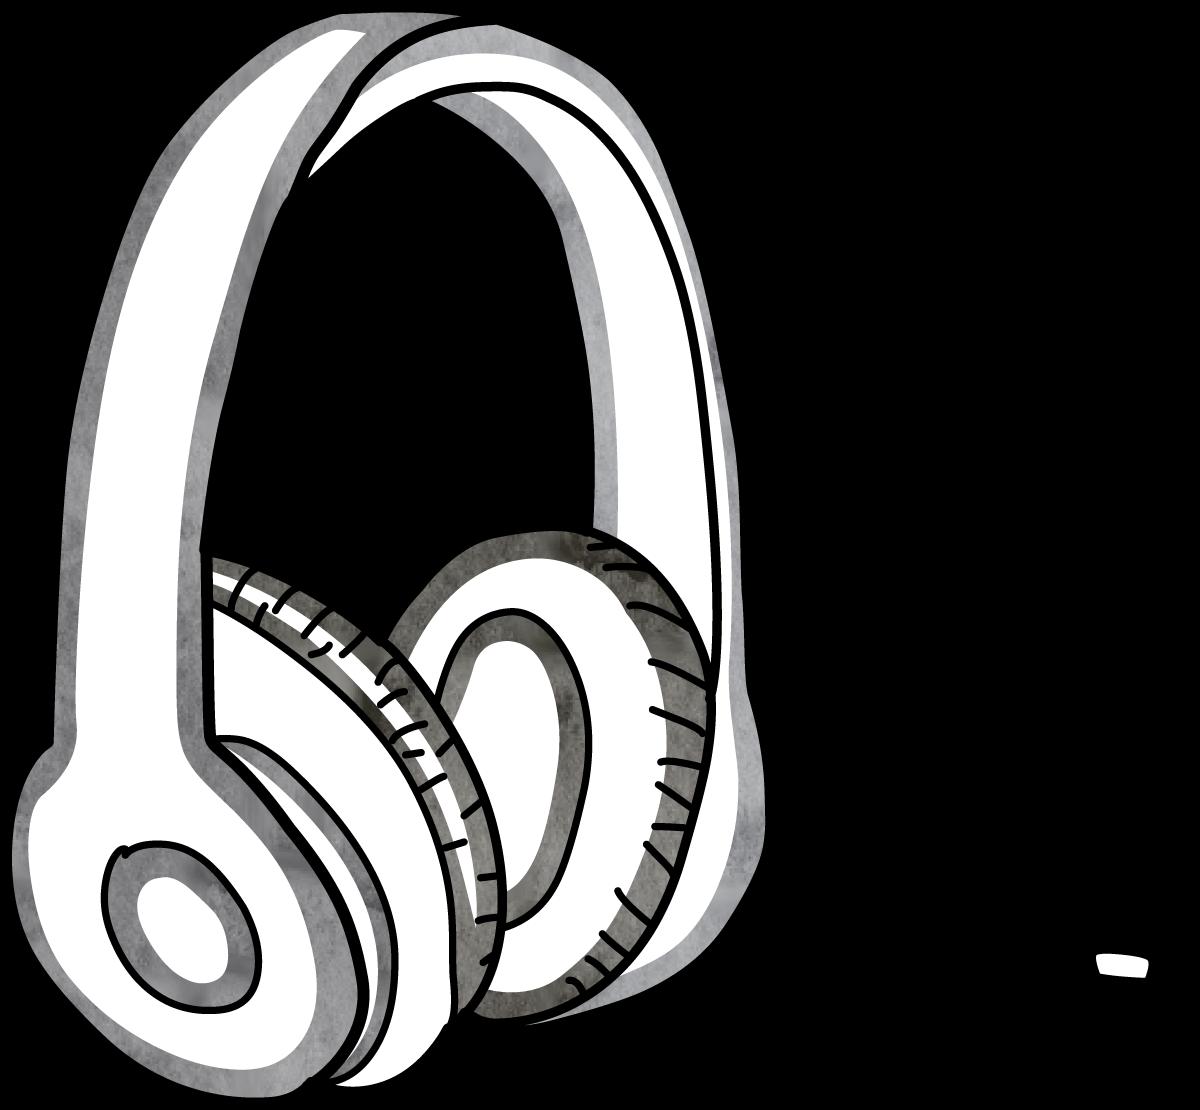 Headphone head drawing